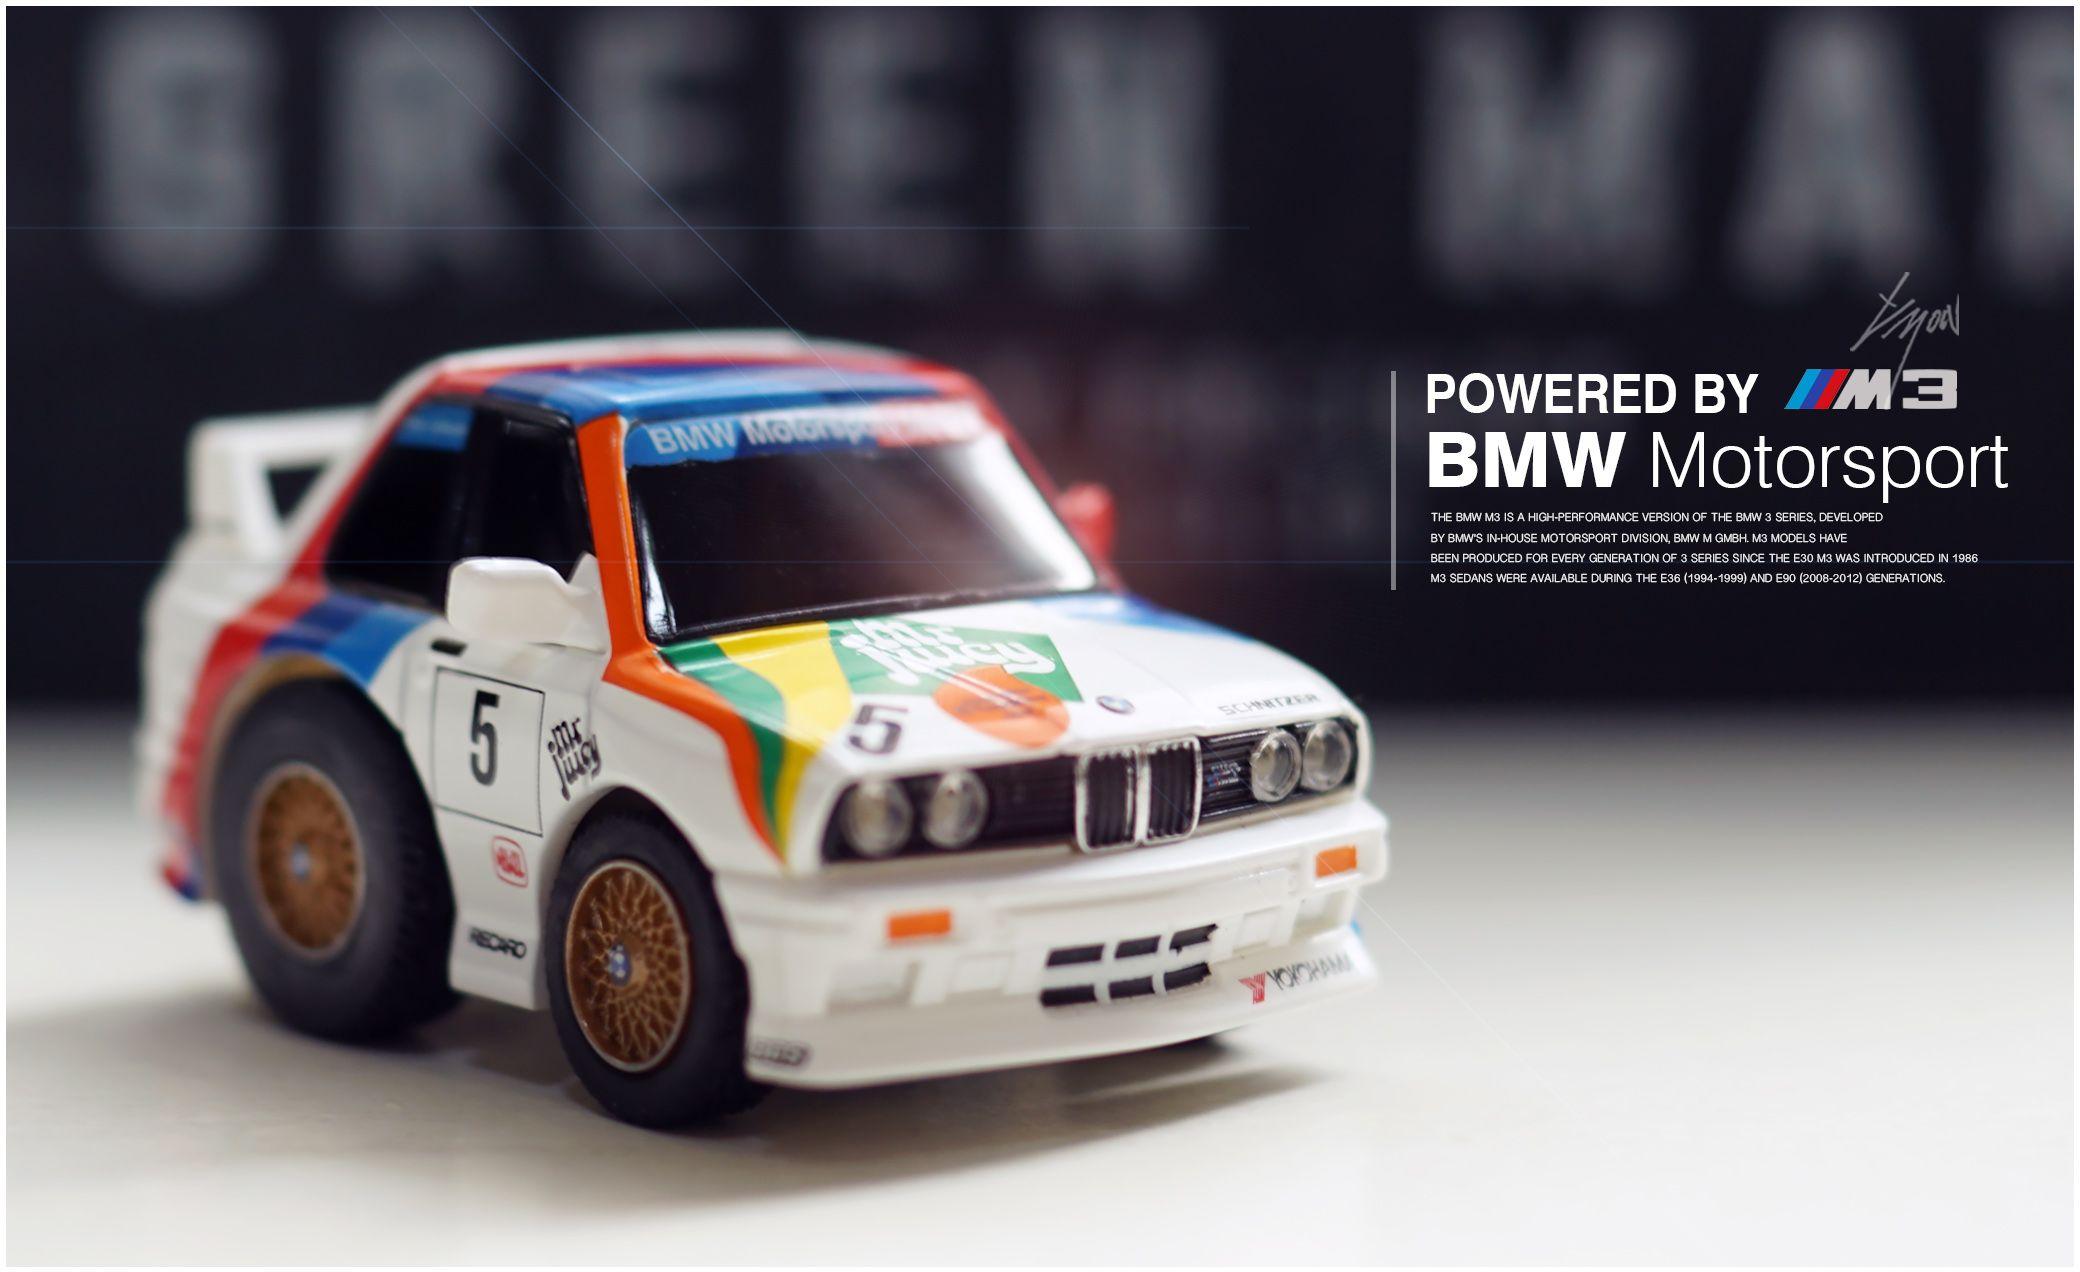 Pin By Amonlin On Choro Q Toy Car Bmw Motorsport